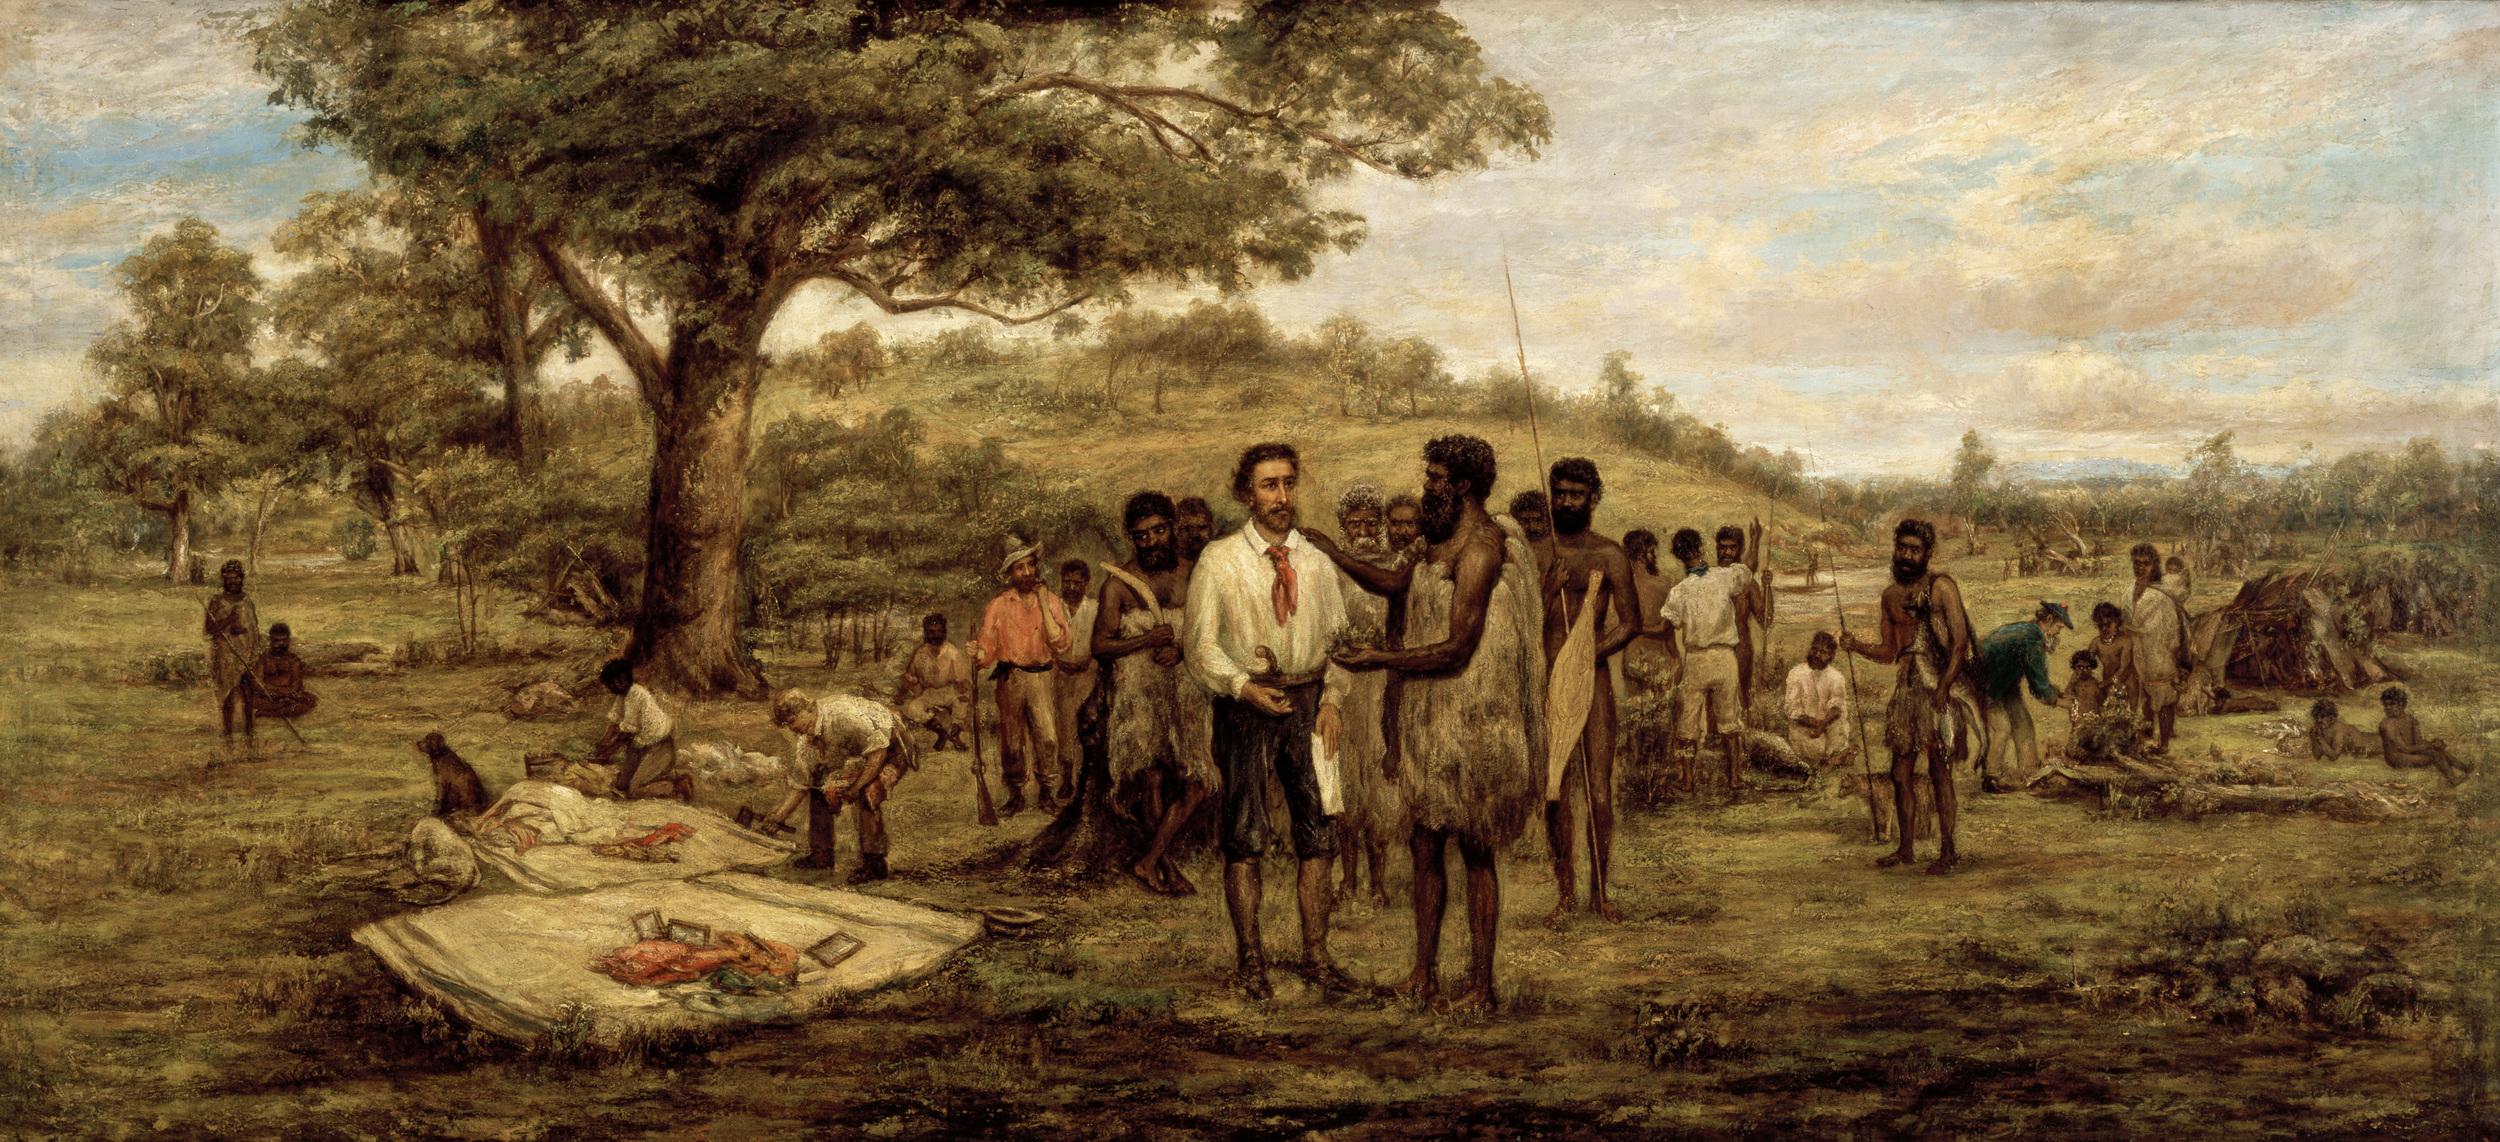 Batman's Treaty with the Aborigines at Merri Creek by John Wesley Burtt, circa 1875.